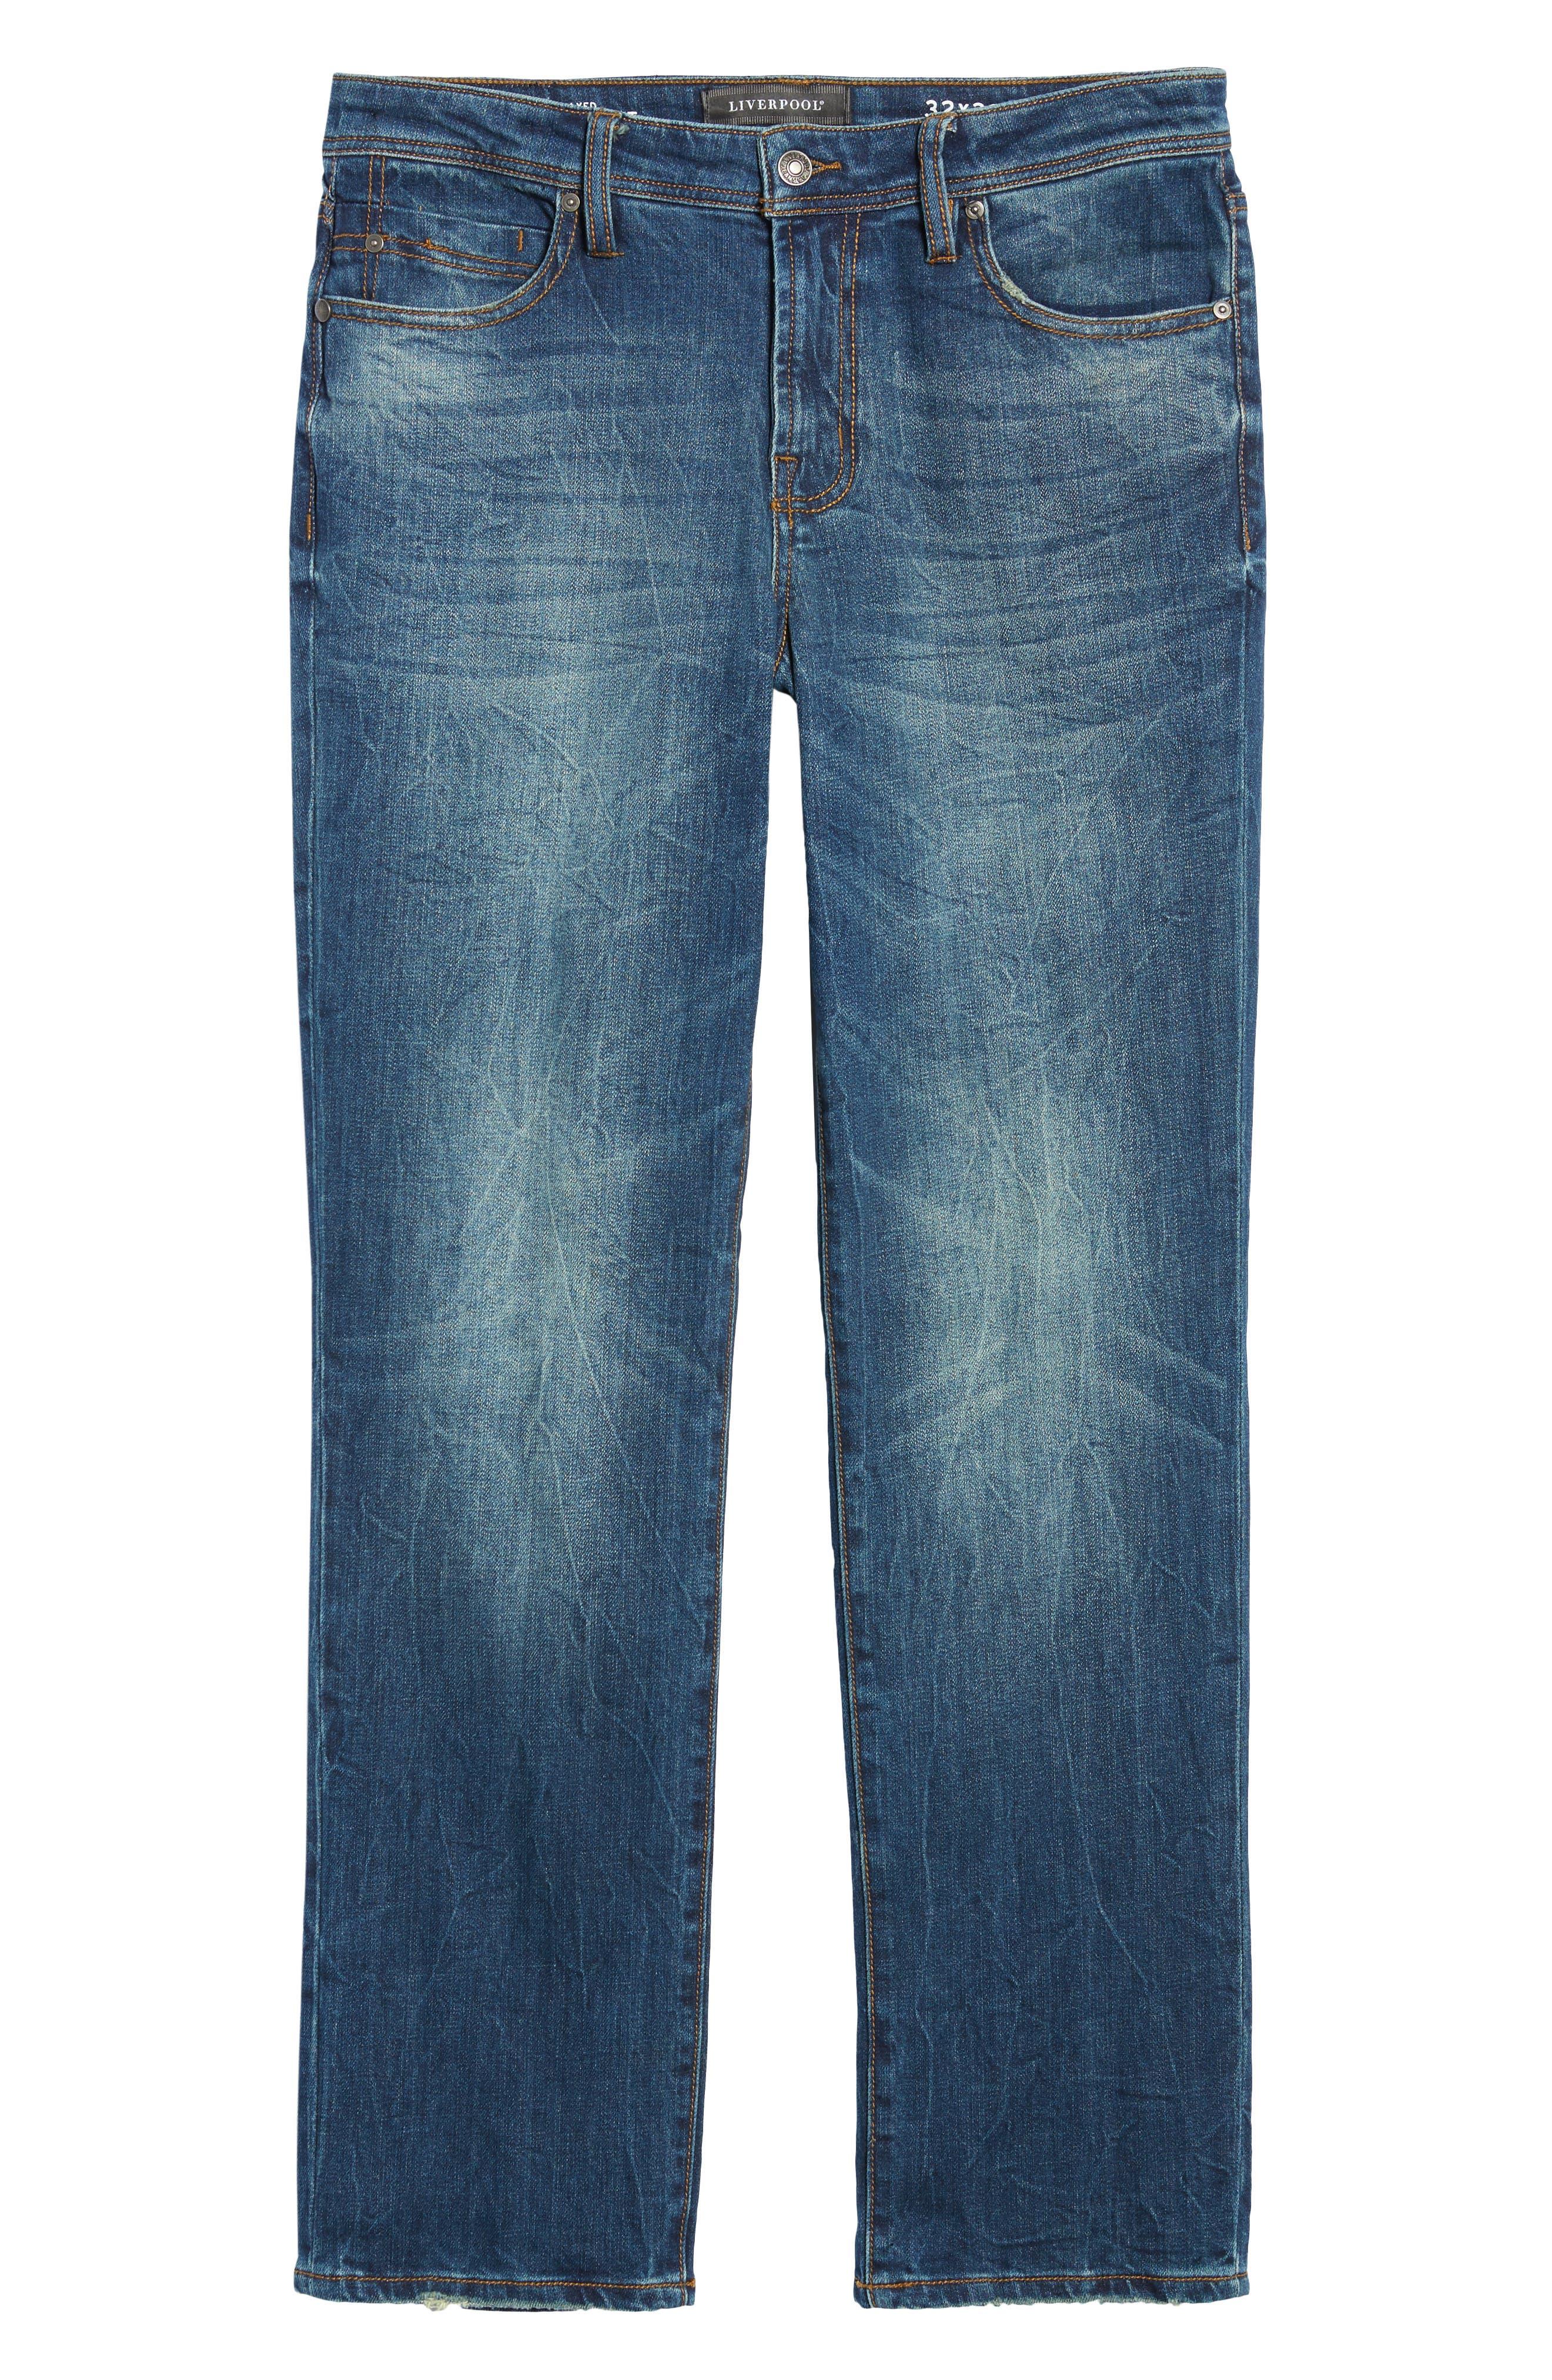 Jeans Co. Regent Relaxed Fit Jeans,                             Alternate thumbnail 6, color,                             Odessa Vintage Medium